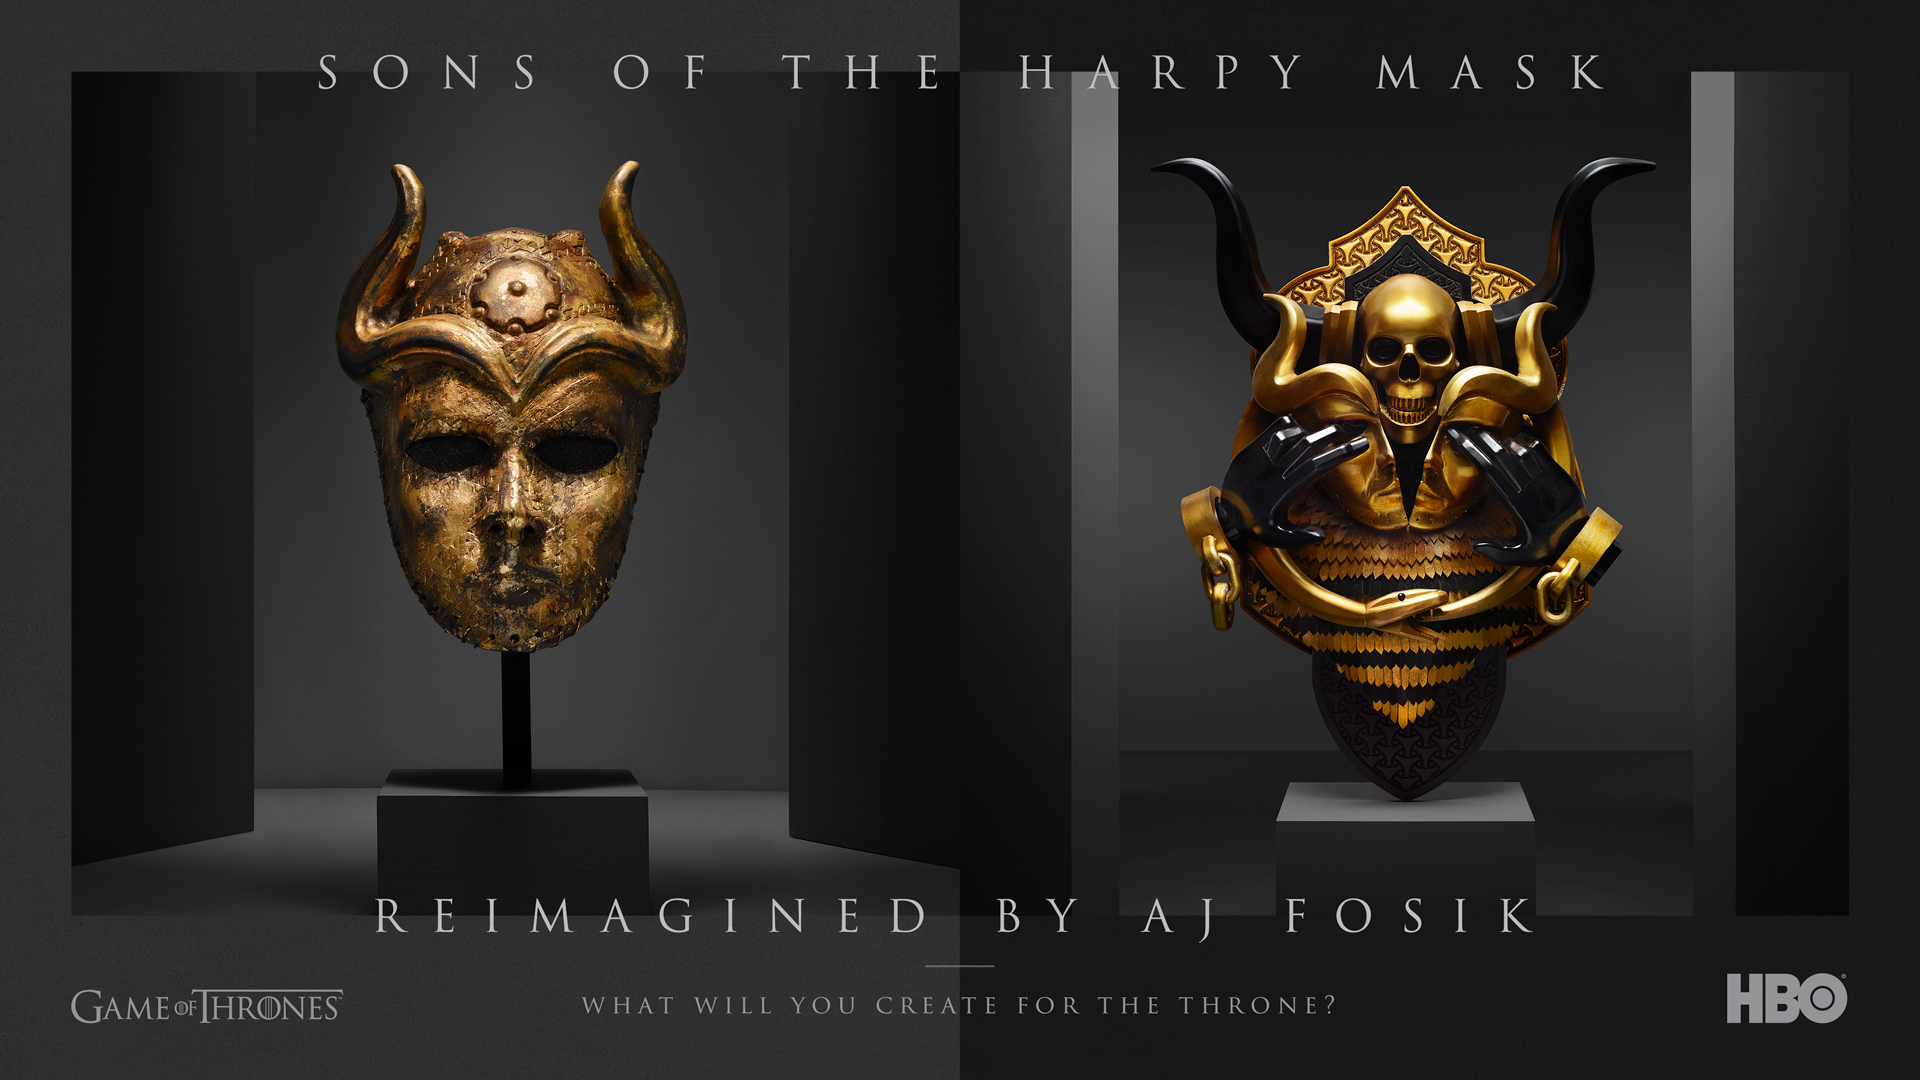 02_FASHION_Sons_of_the_Harpy_Mask_AJ_Fosik.jpg